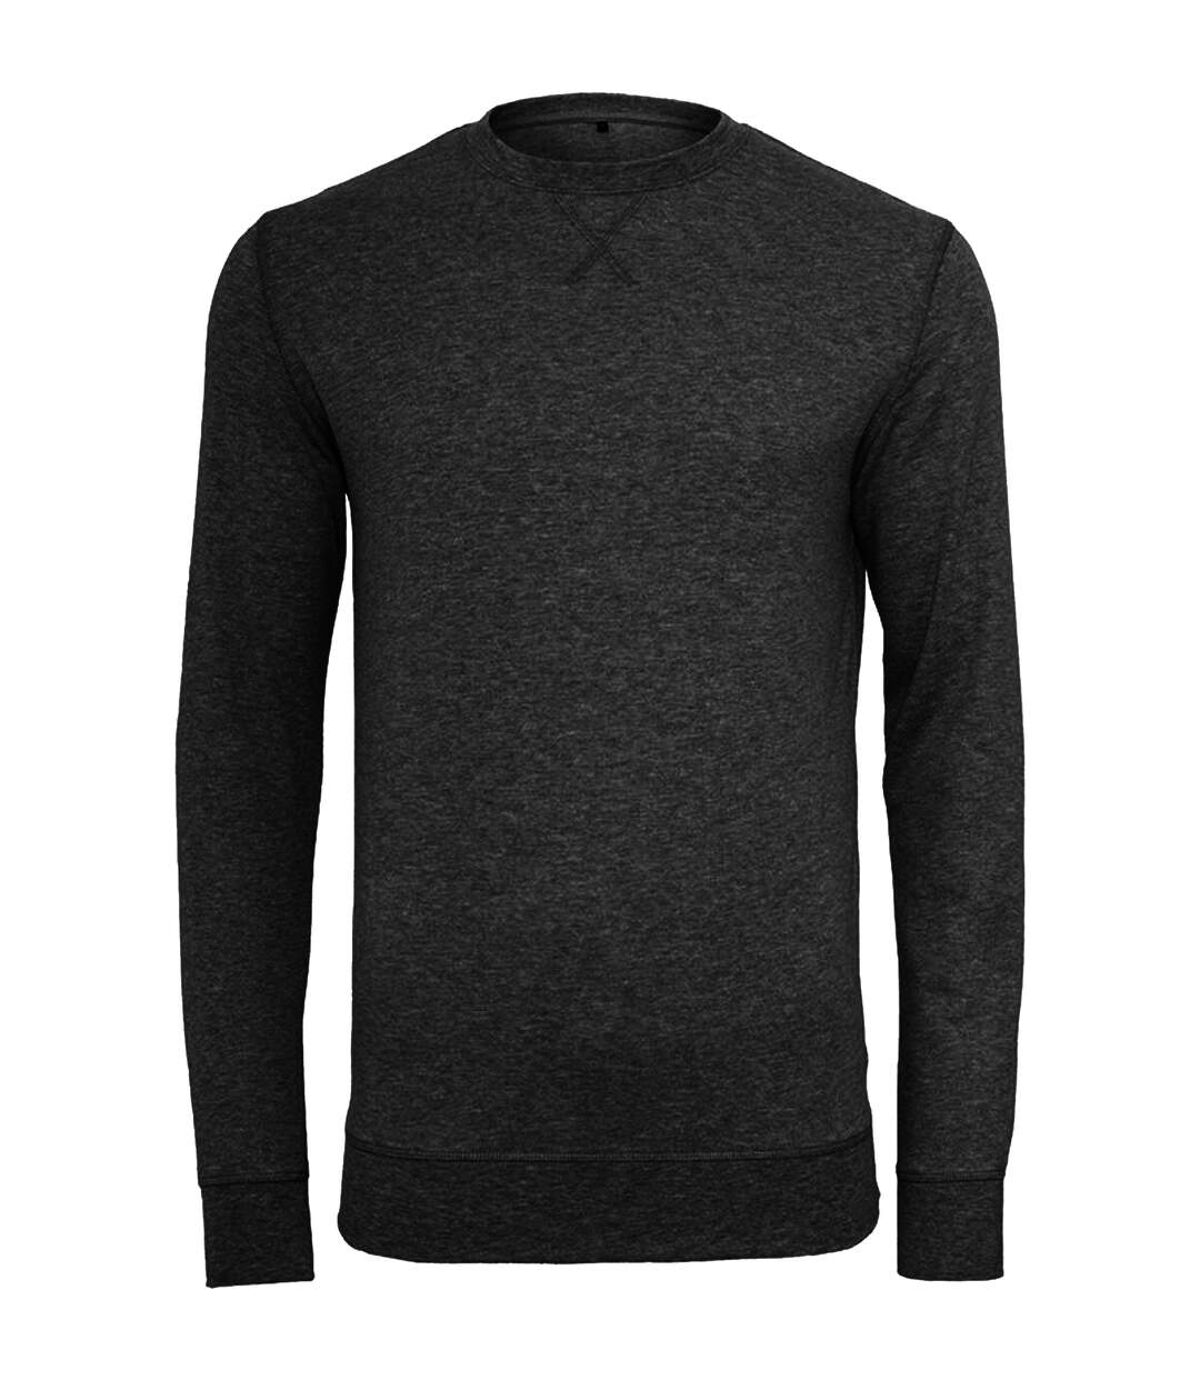 Build Your Brand Mens Plain Light Crewneck Sweater (Black) - UTRW5682